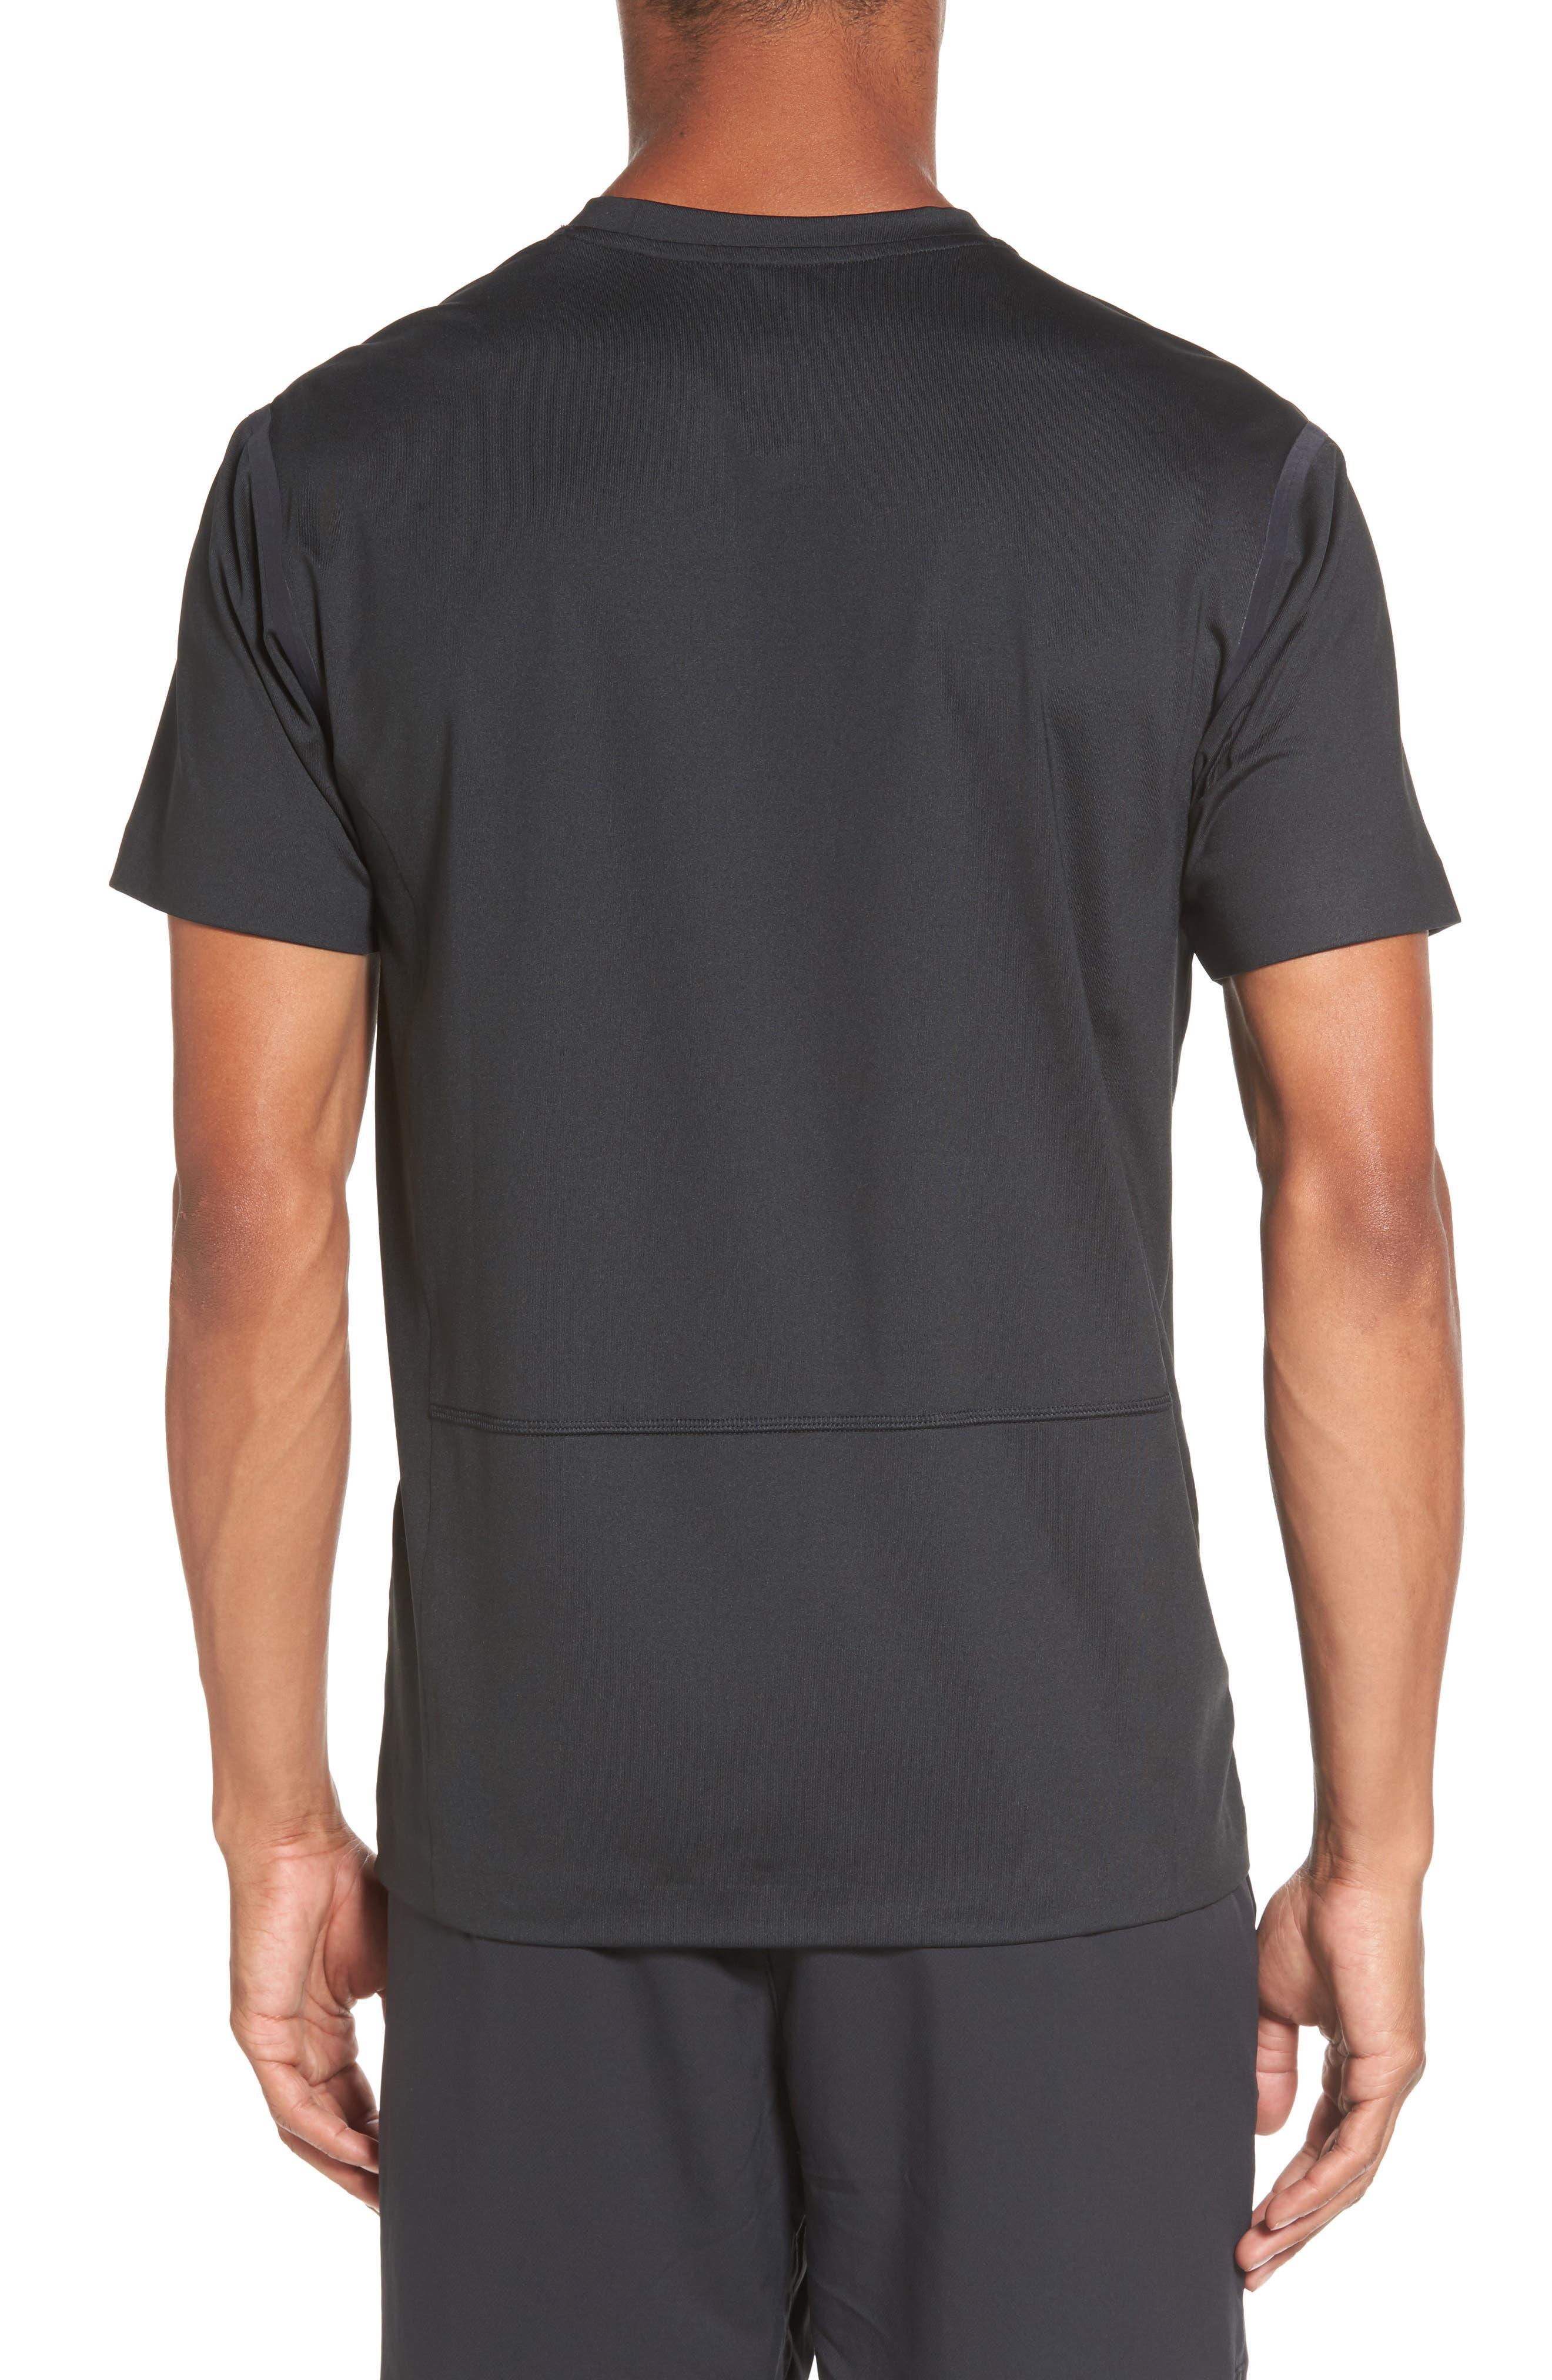 Alternate Image 2  - RVCA VA Compression T-Shirt